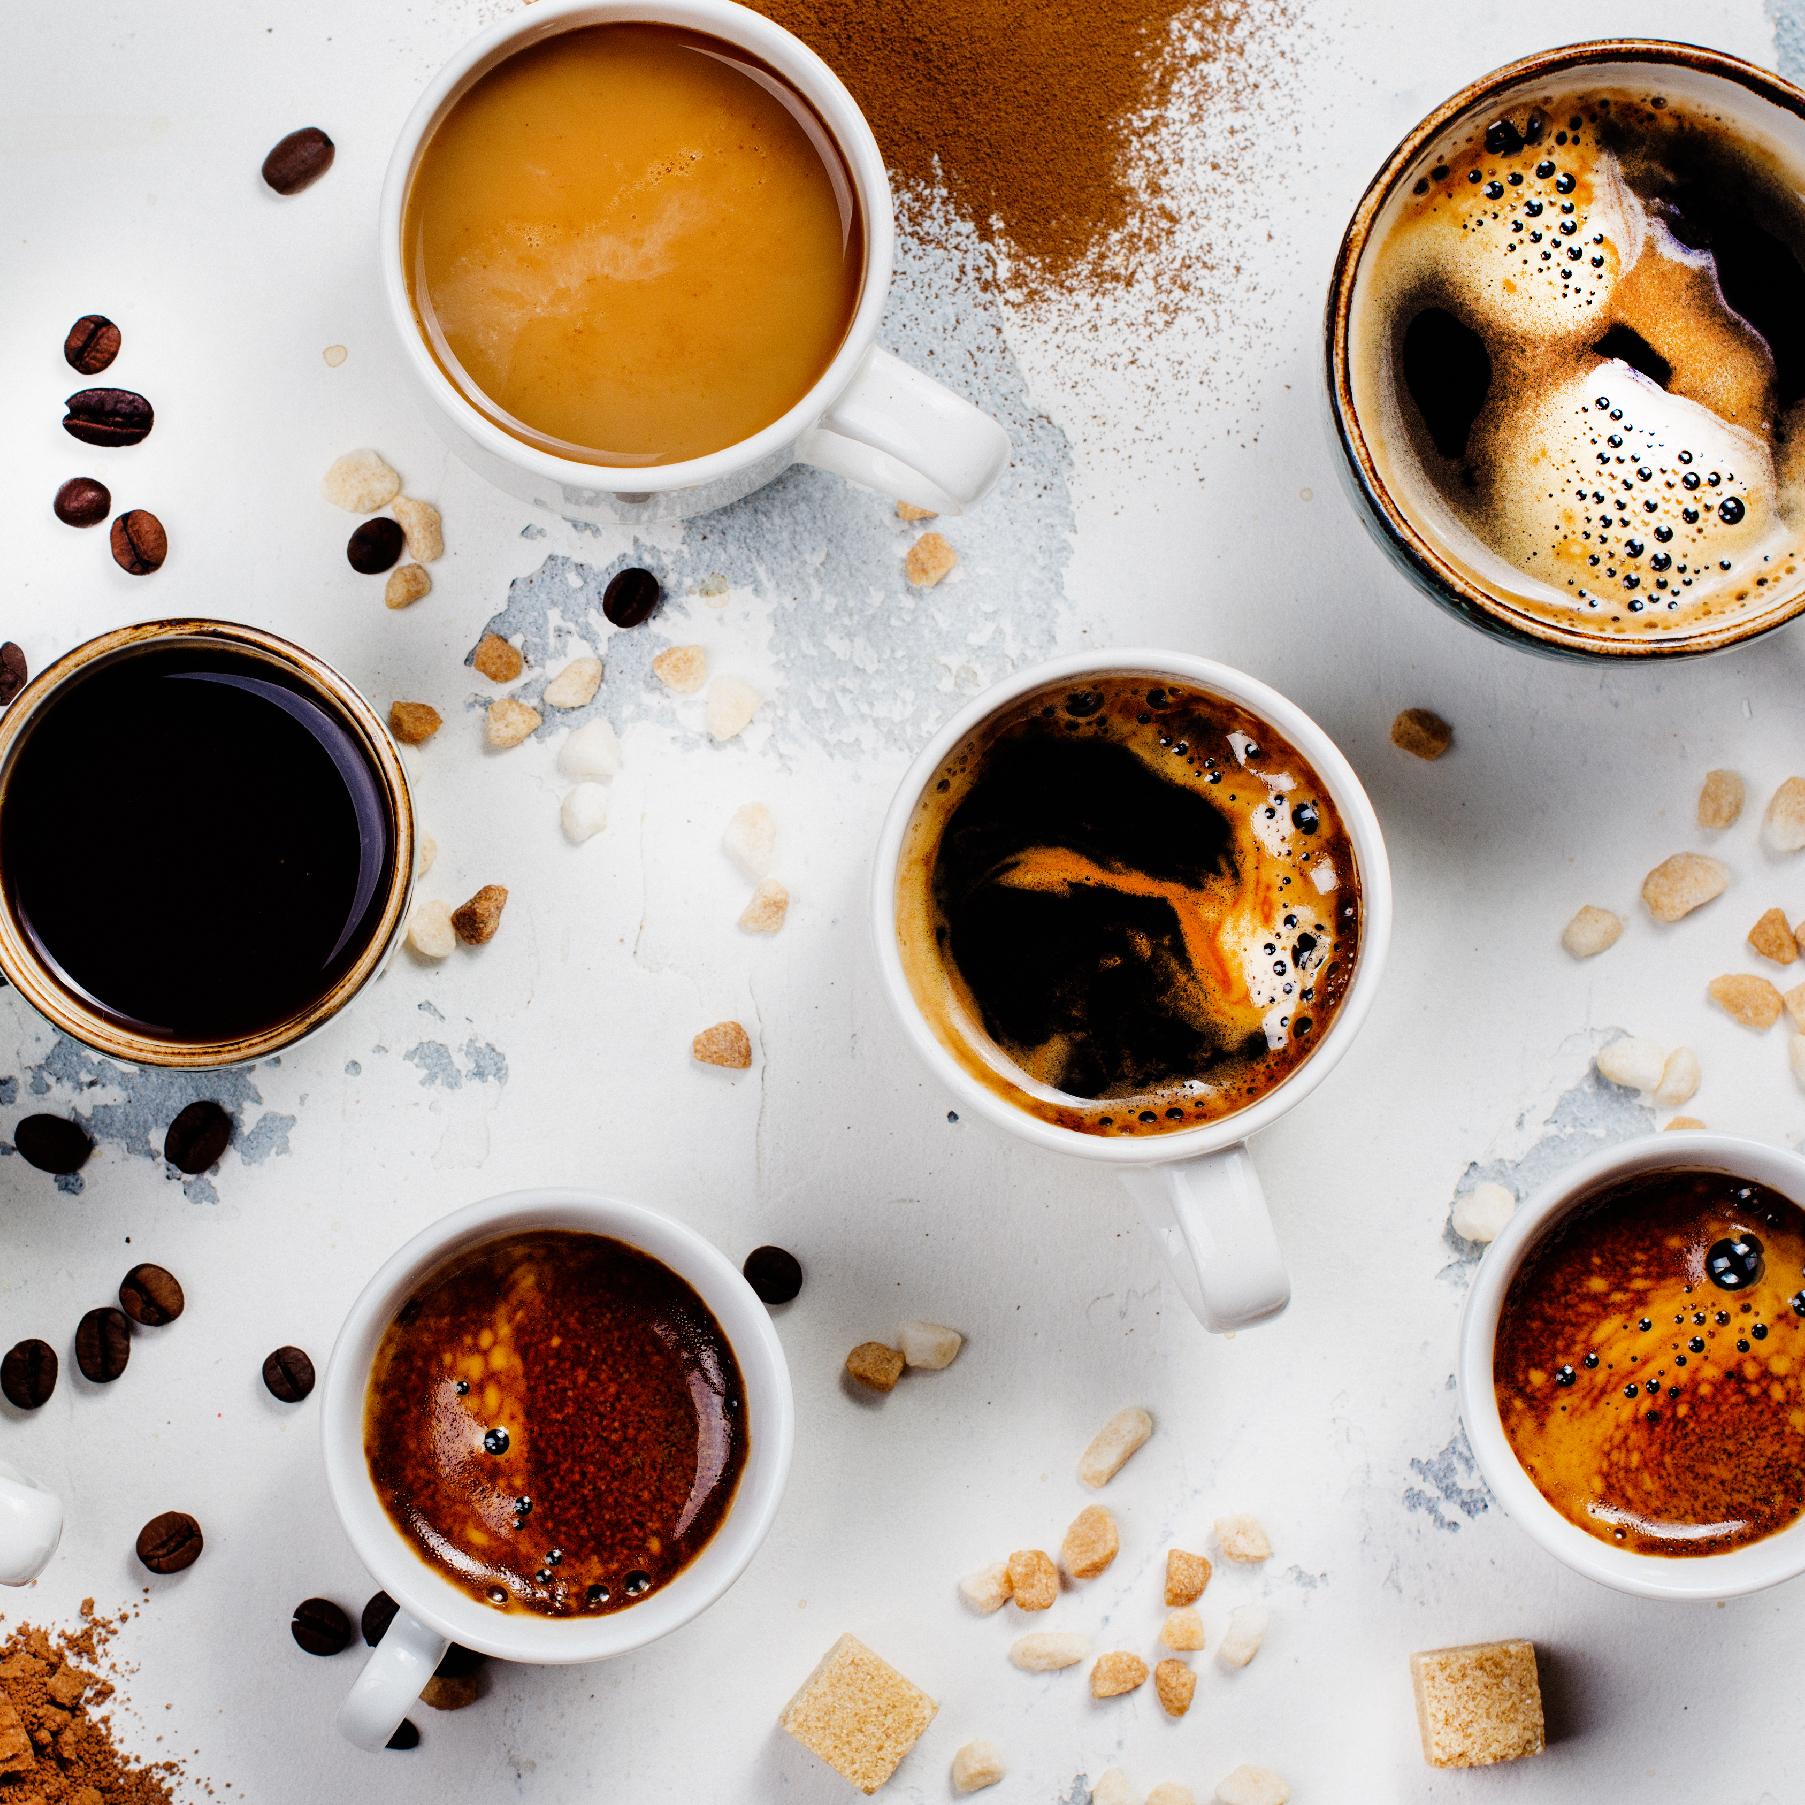 SPOINK COFFEE